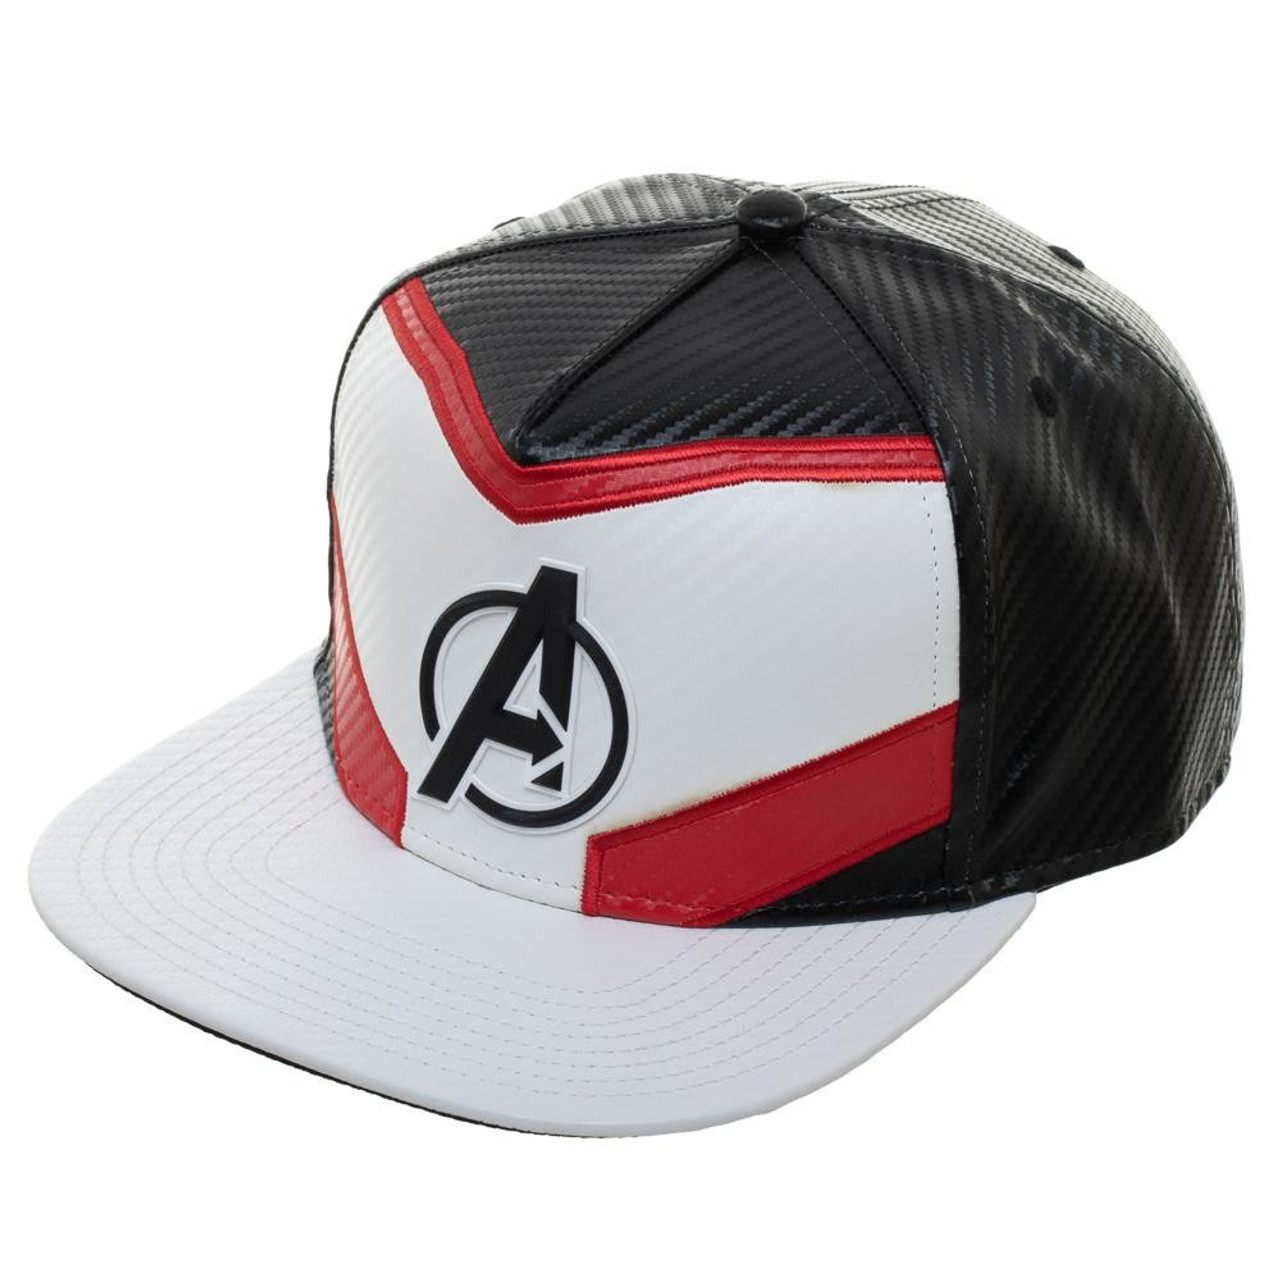 9ad1c0fea75b4 Marvel Avengers Endgame Suit Up Snapback Cap Bioworld LD - ToyWiz